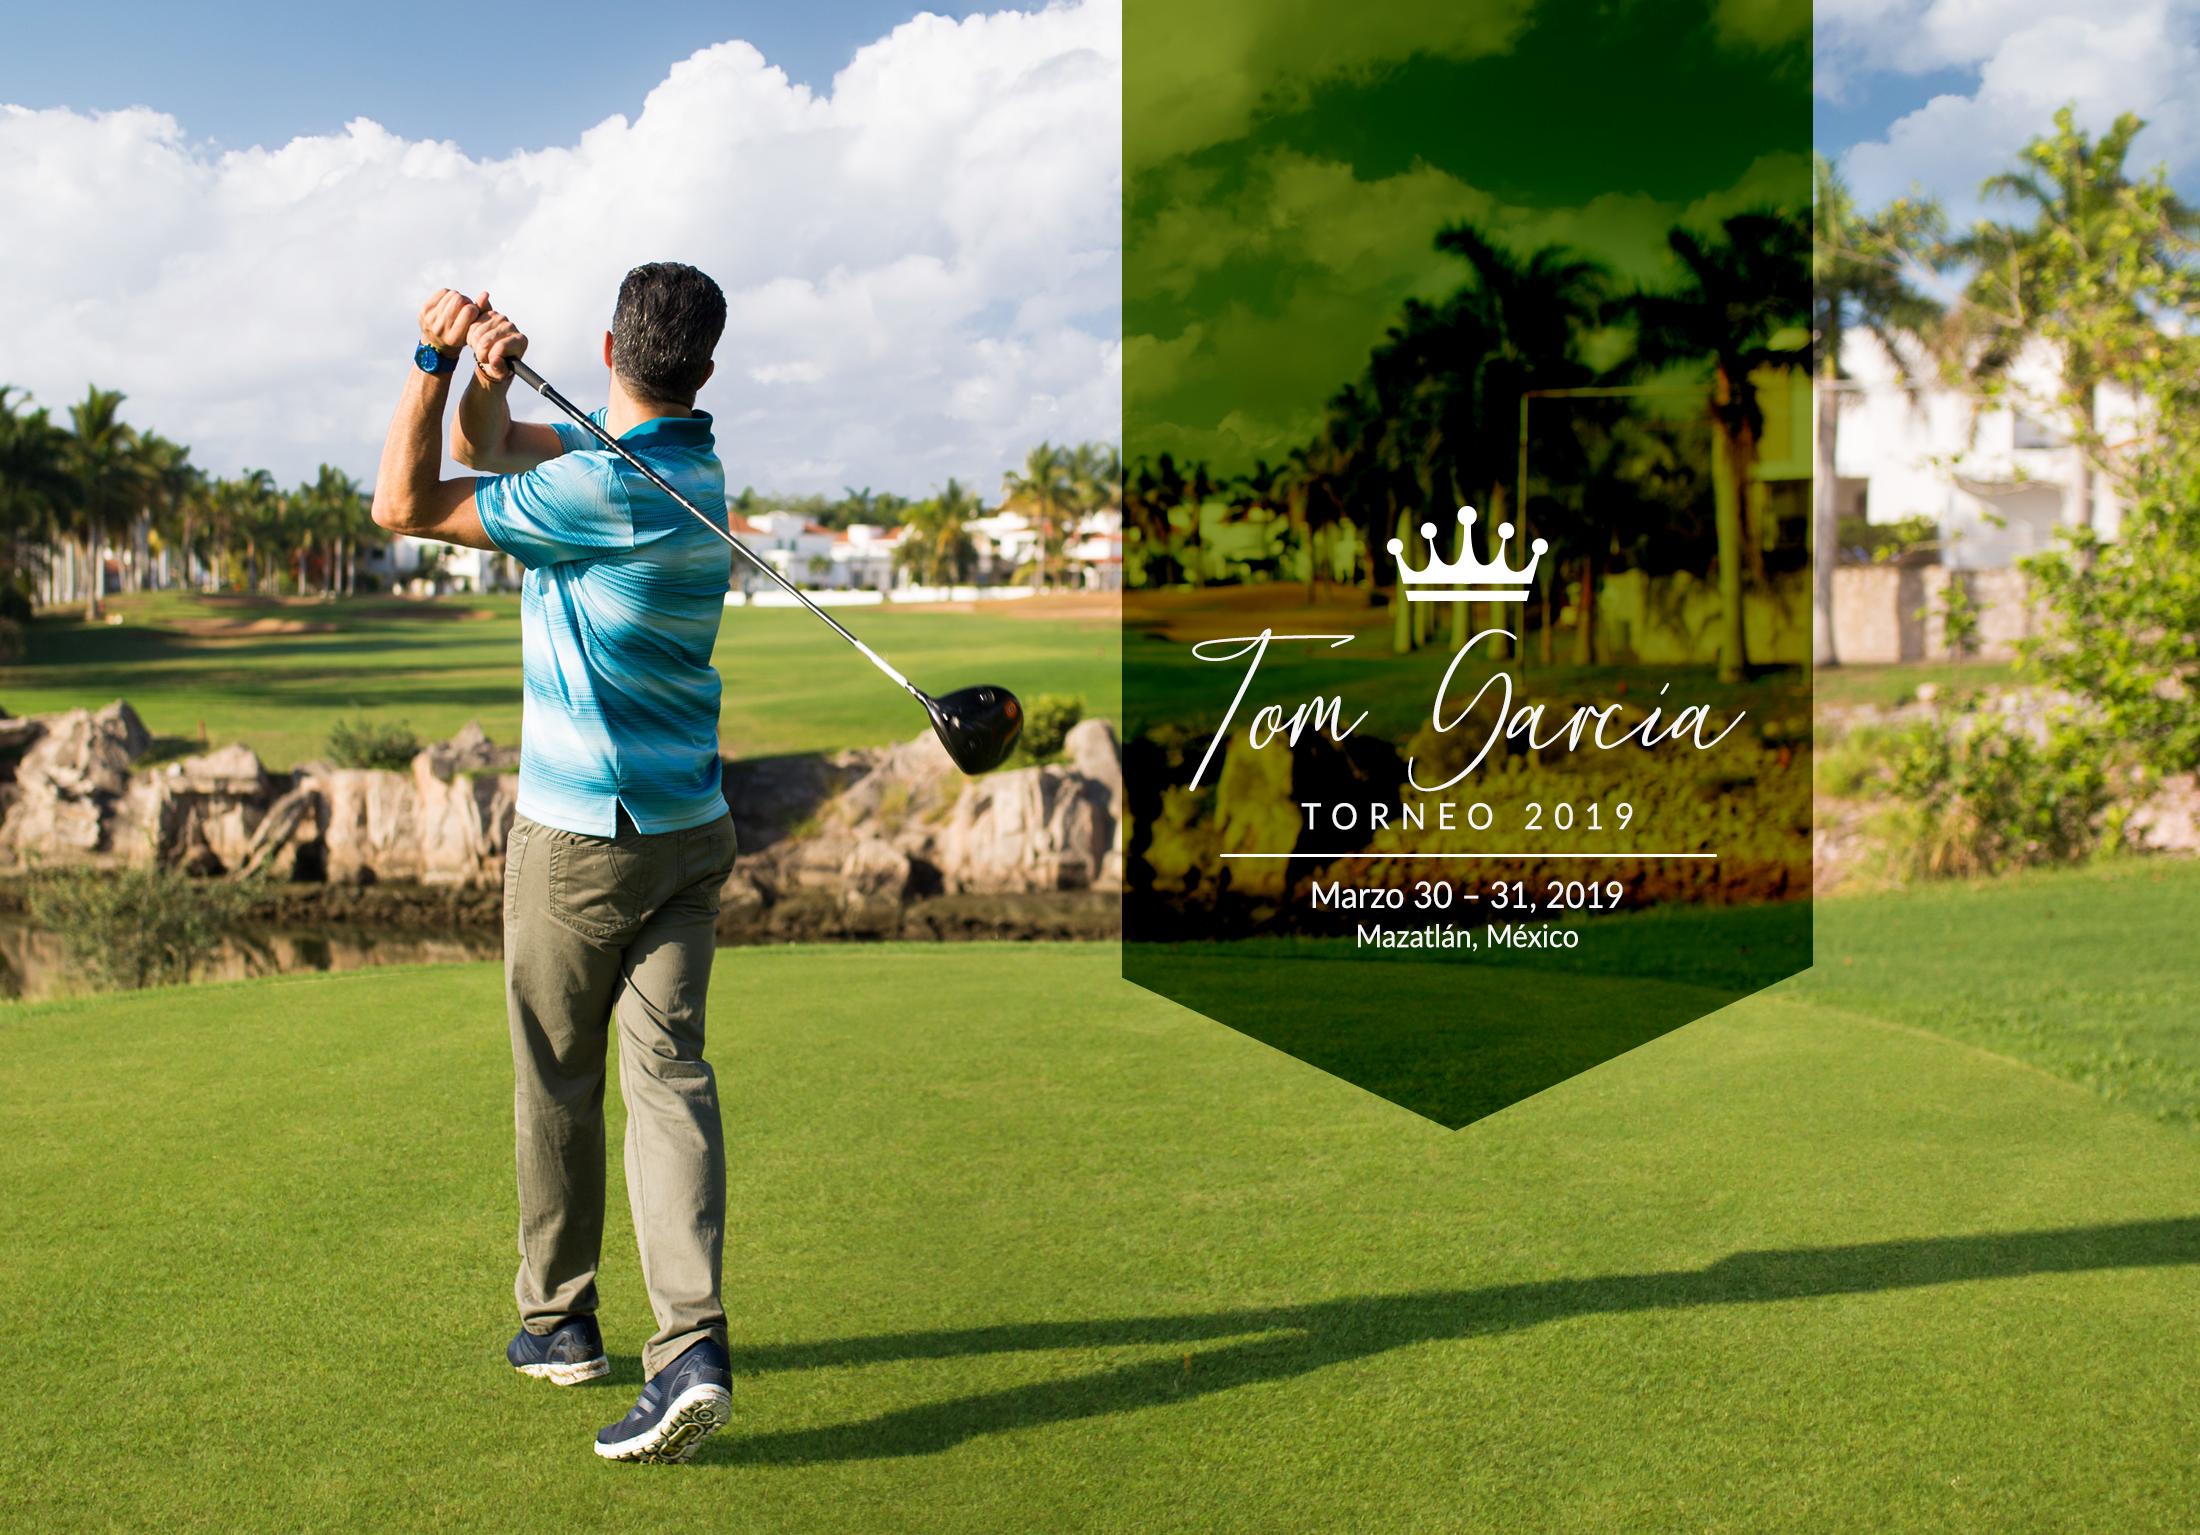 Torneo de Golf Tom García 2019